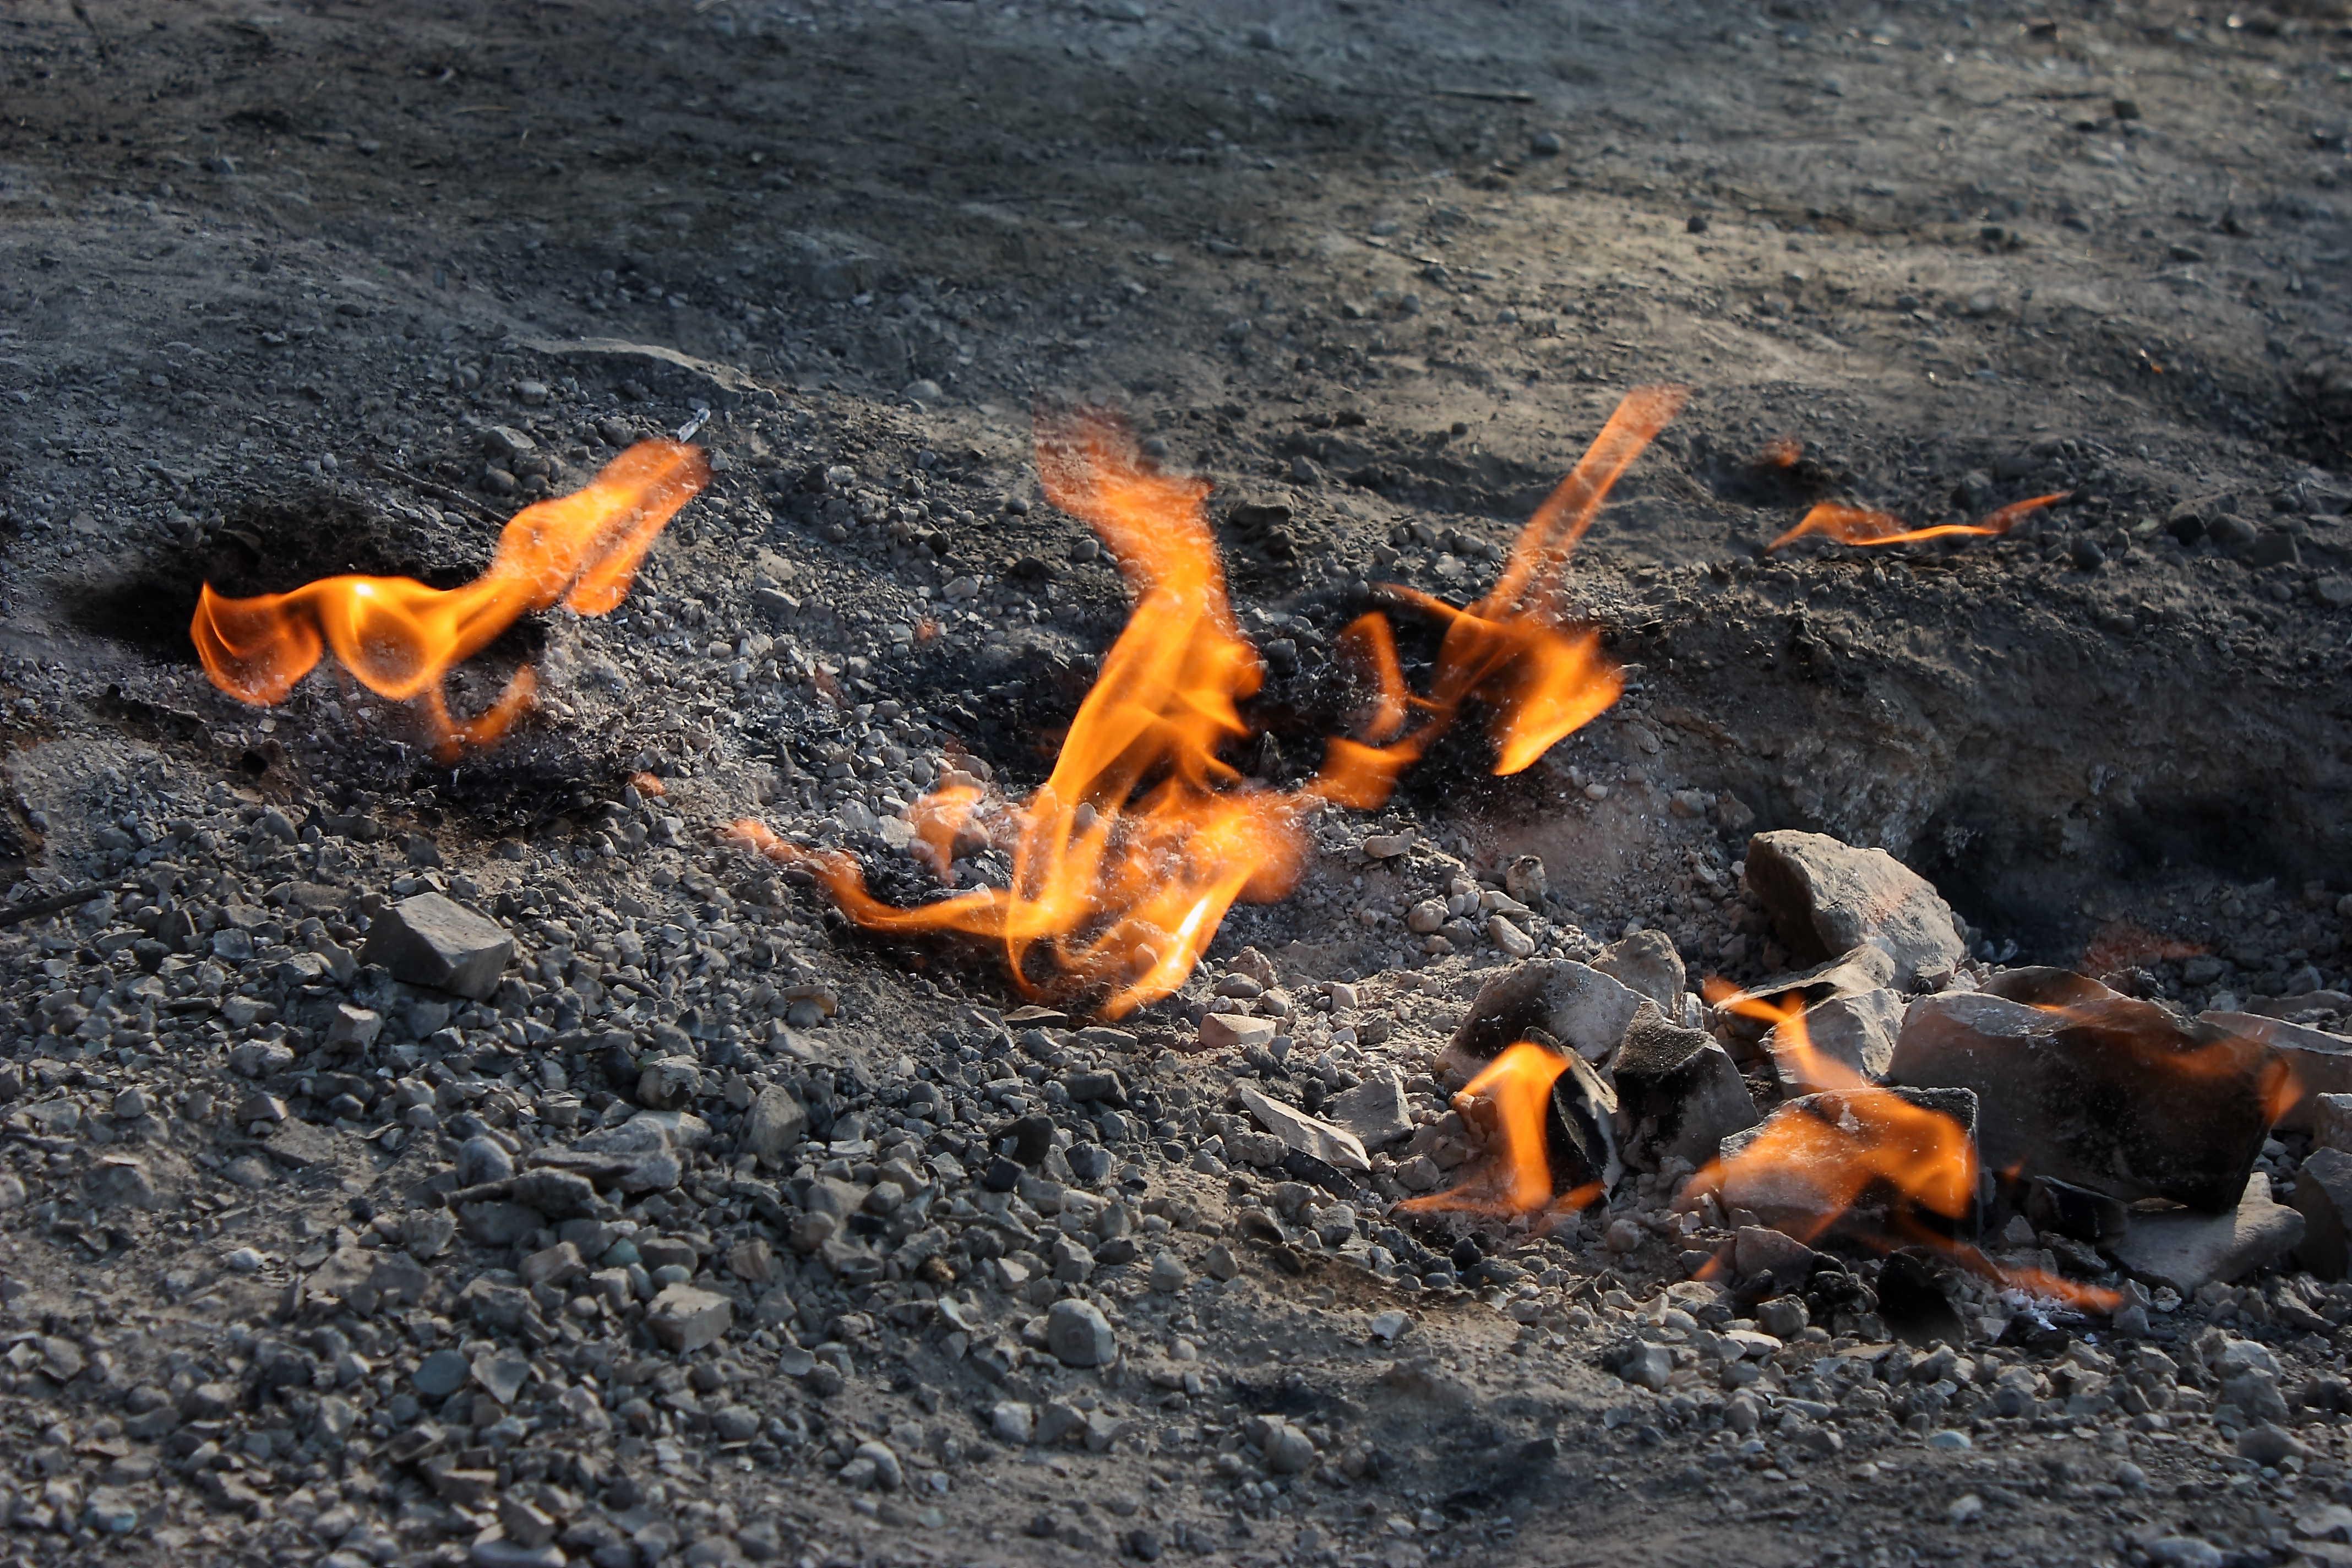 ghid-turistic-focurile-vii-52